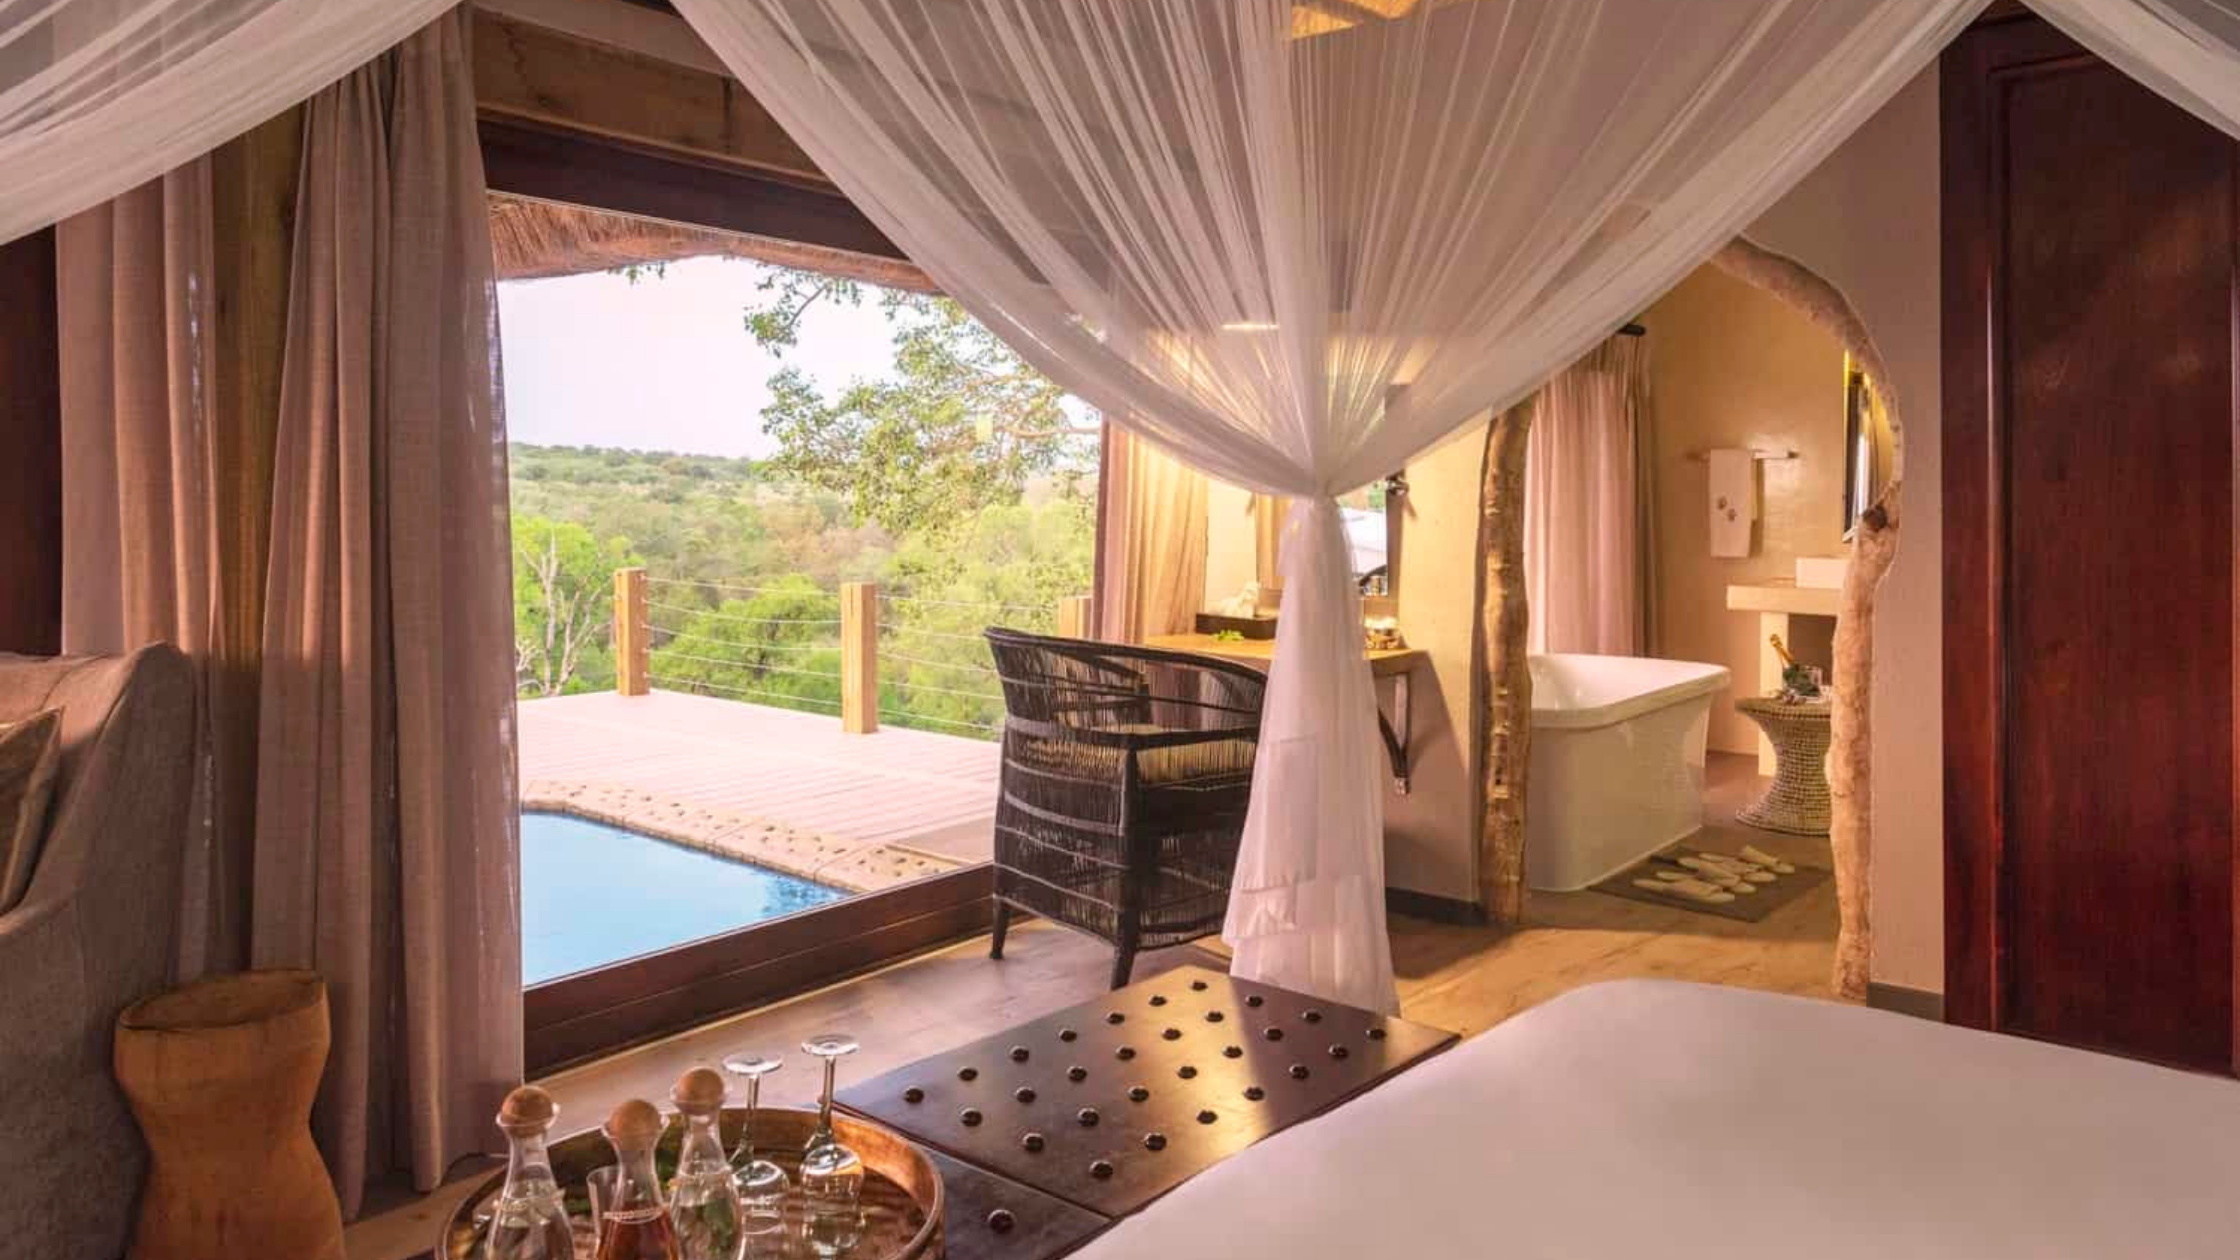 Safari Lodges in South Africa: Leopard Hills in Sabi Sand Game Reserve